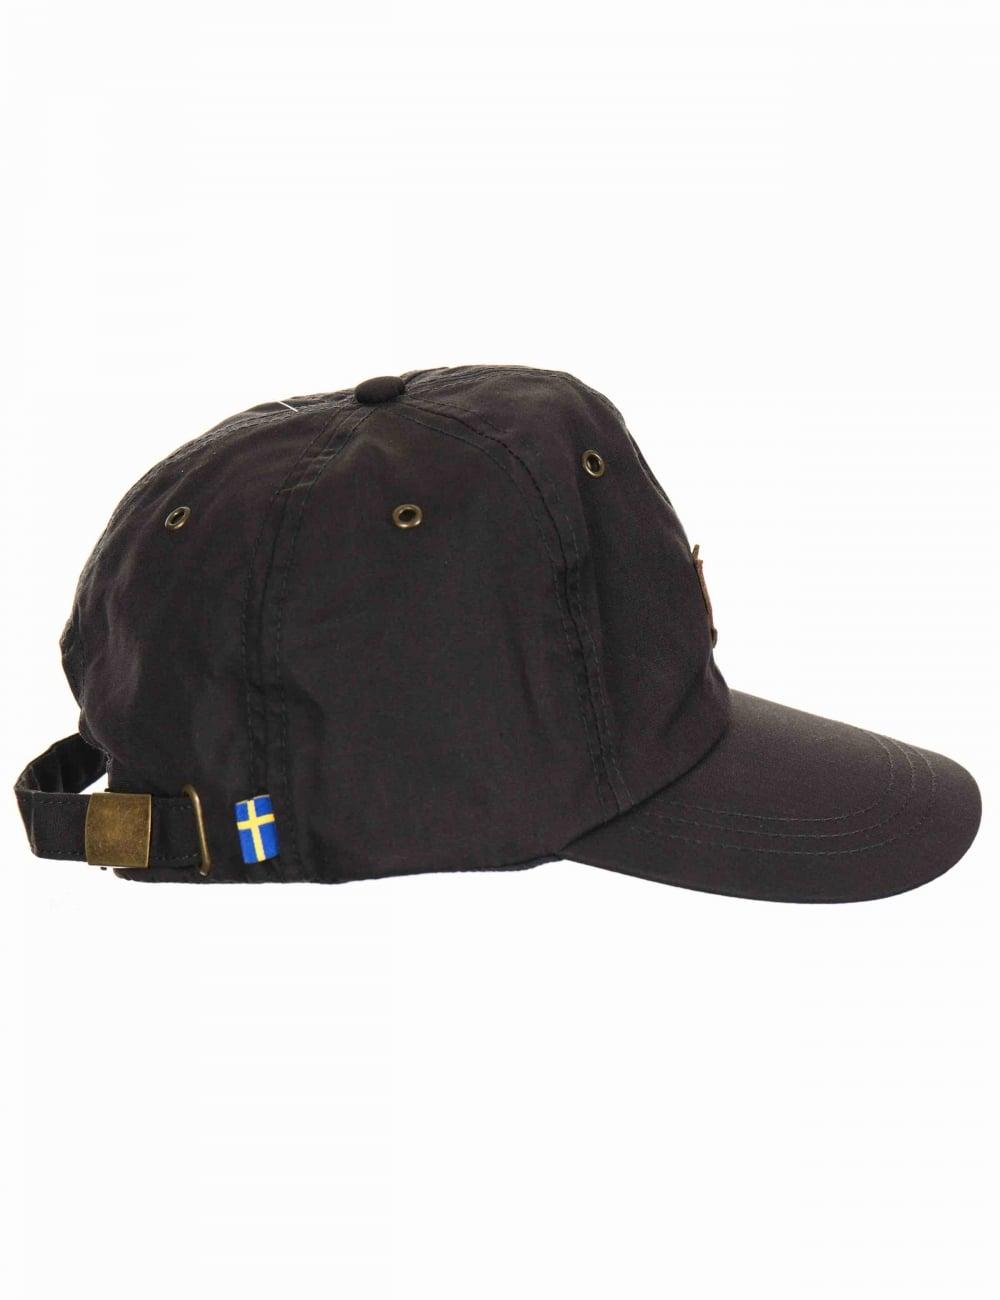 Helags Baseball Cap - Grey Fj?llr?ven PF2EVdCUn